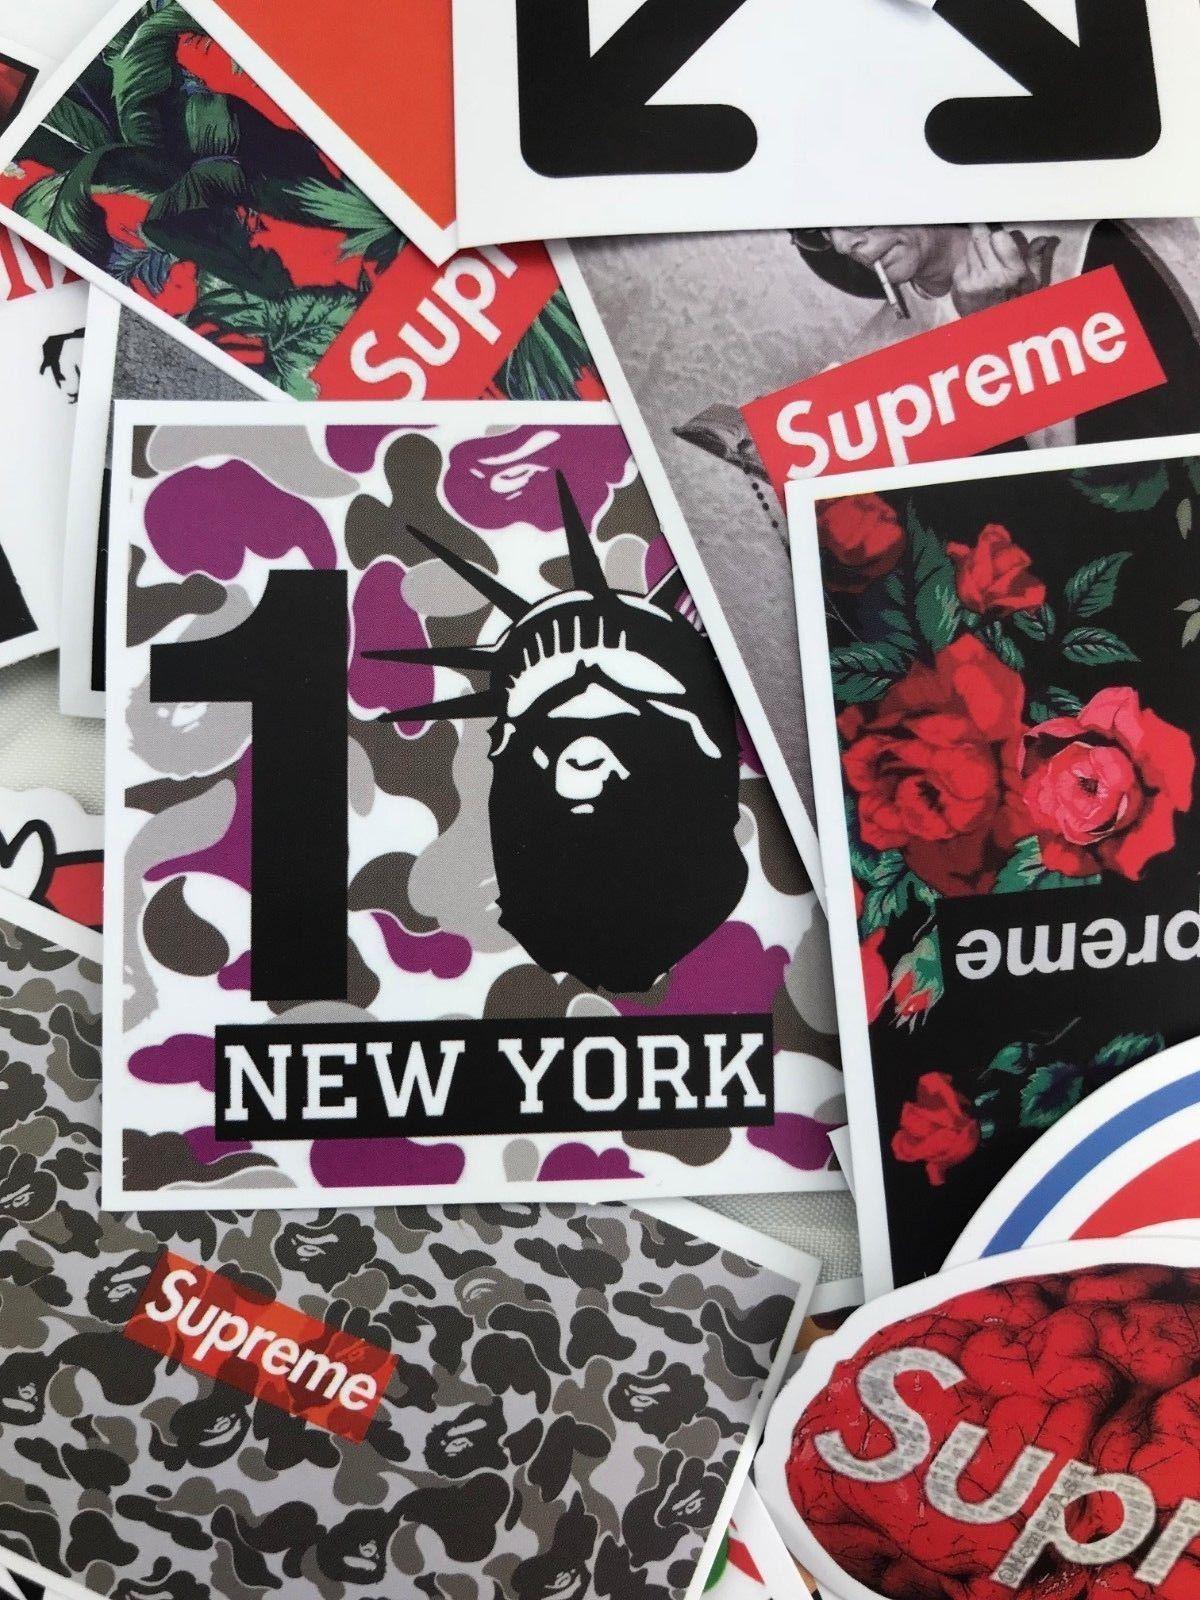 100 Random Sticker Pack Hypebeast Supreme Bape Off White Vlone Streetwear